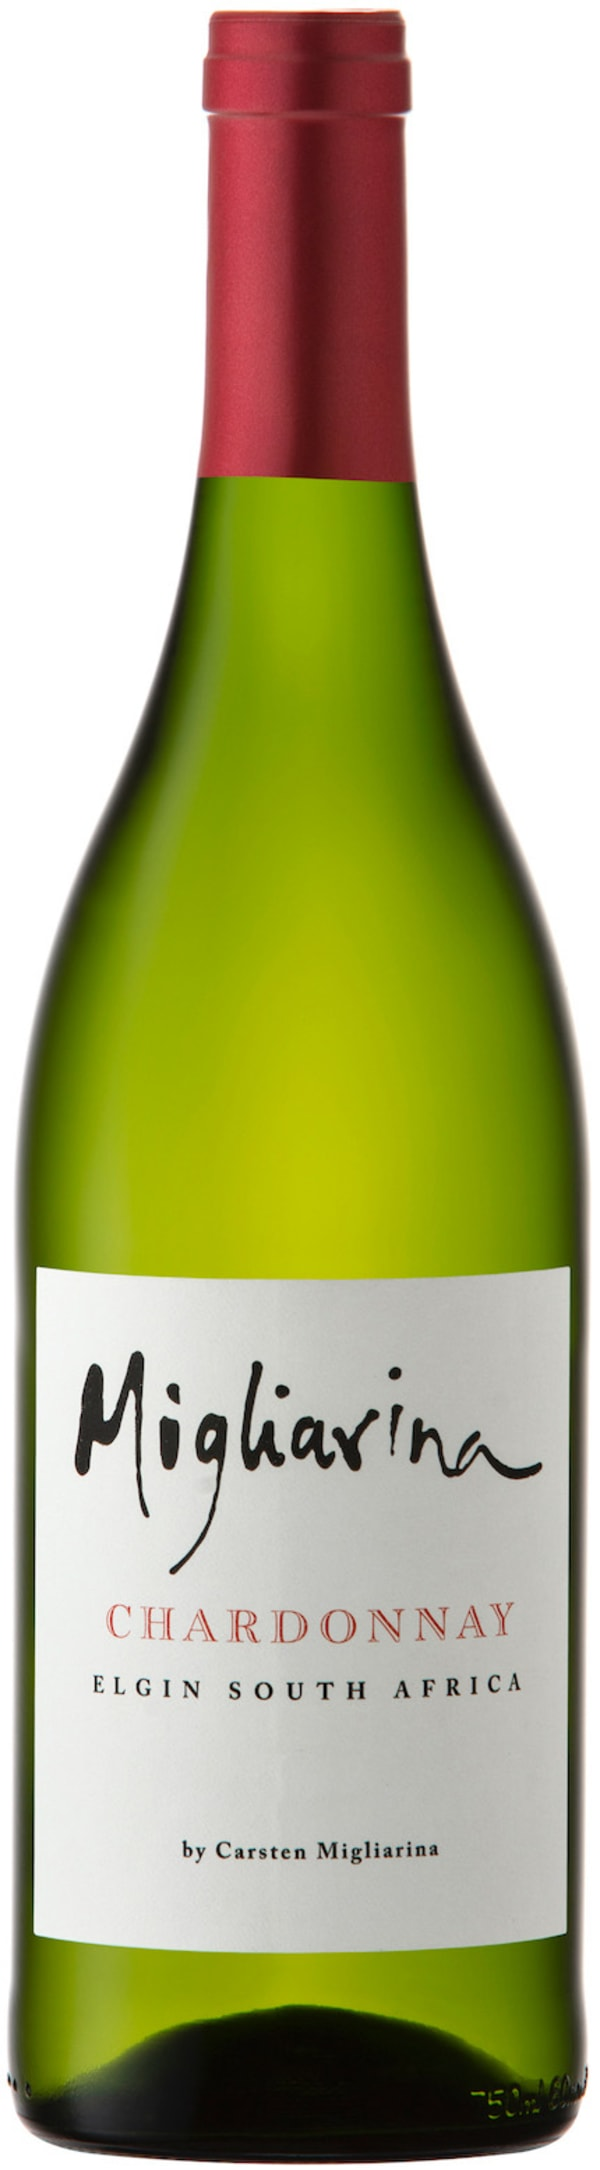 Migliarina Chardonnay 2019